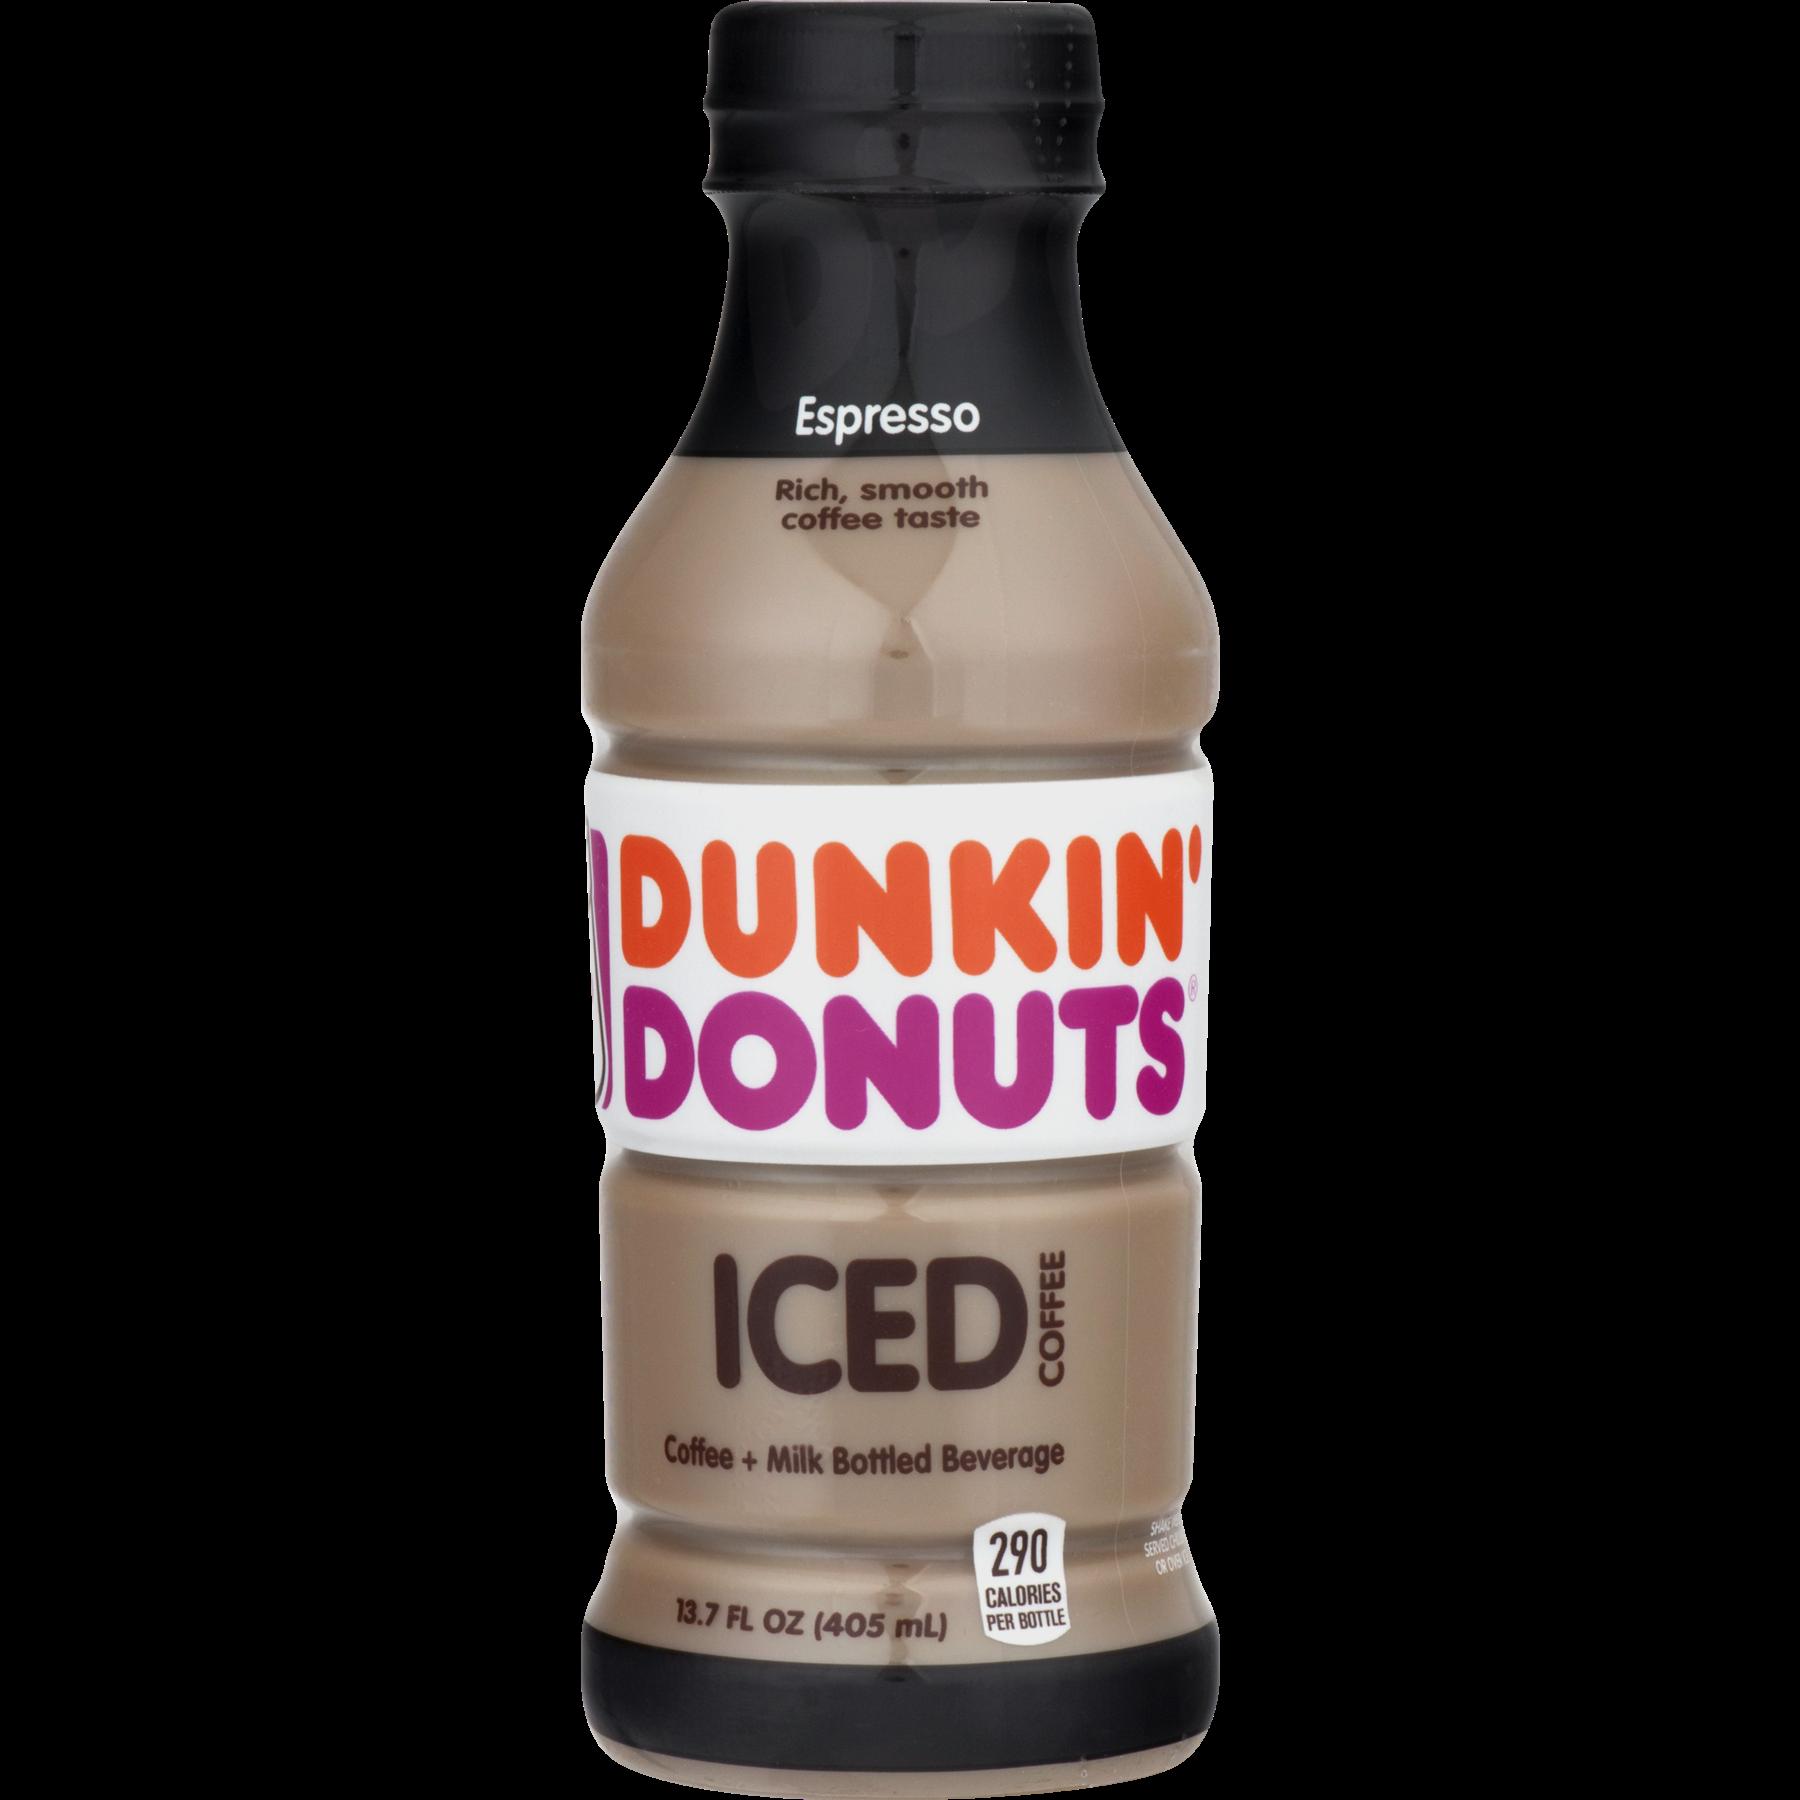 Dunkin Donuts Espresso Iced Coffee 137 Fl Oz Bottle